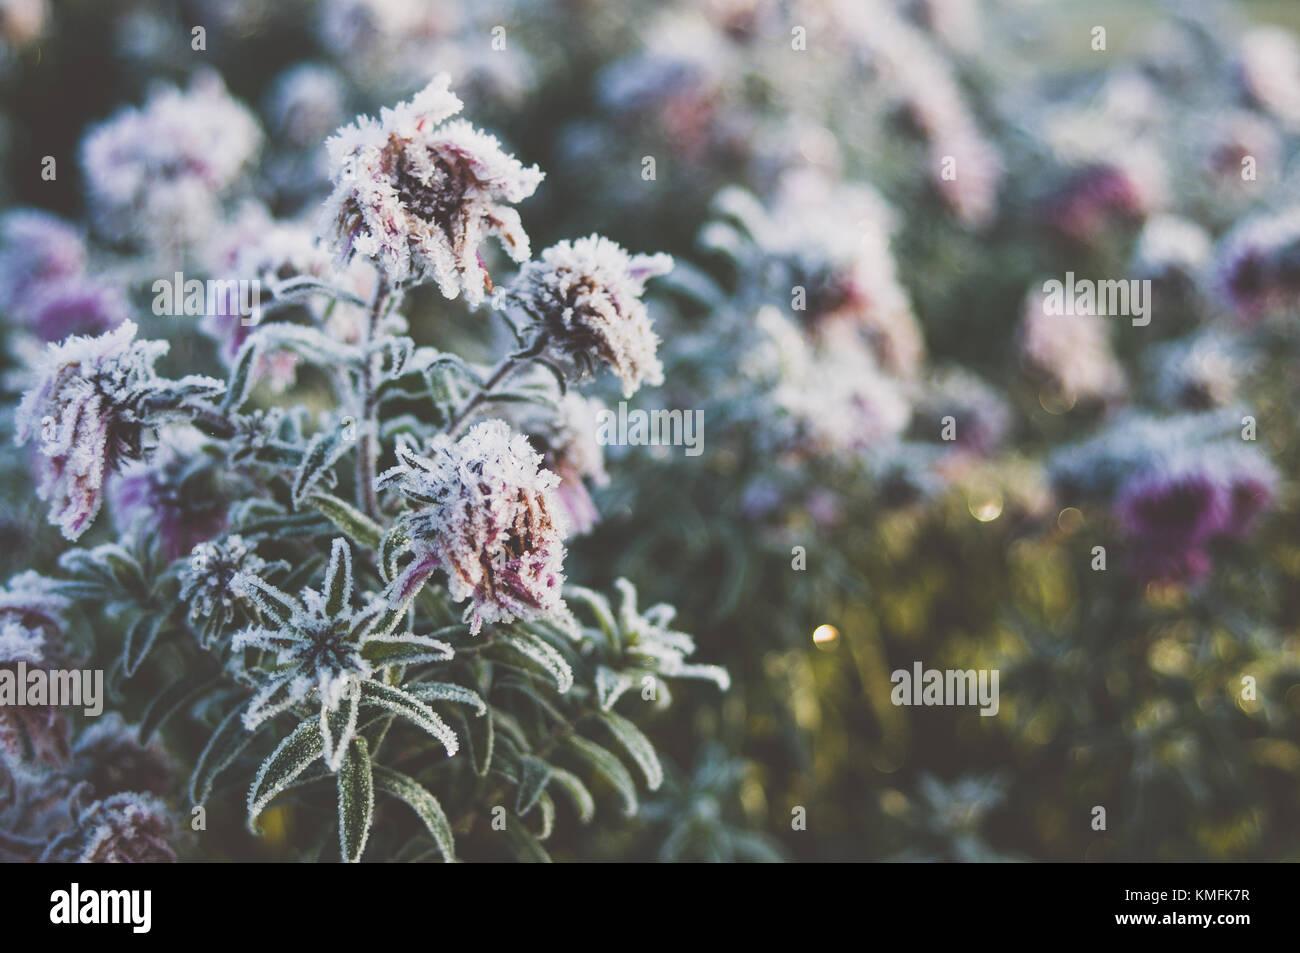 Gefrorene Blumen. Romantische morgen. Stockbild